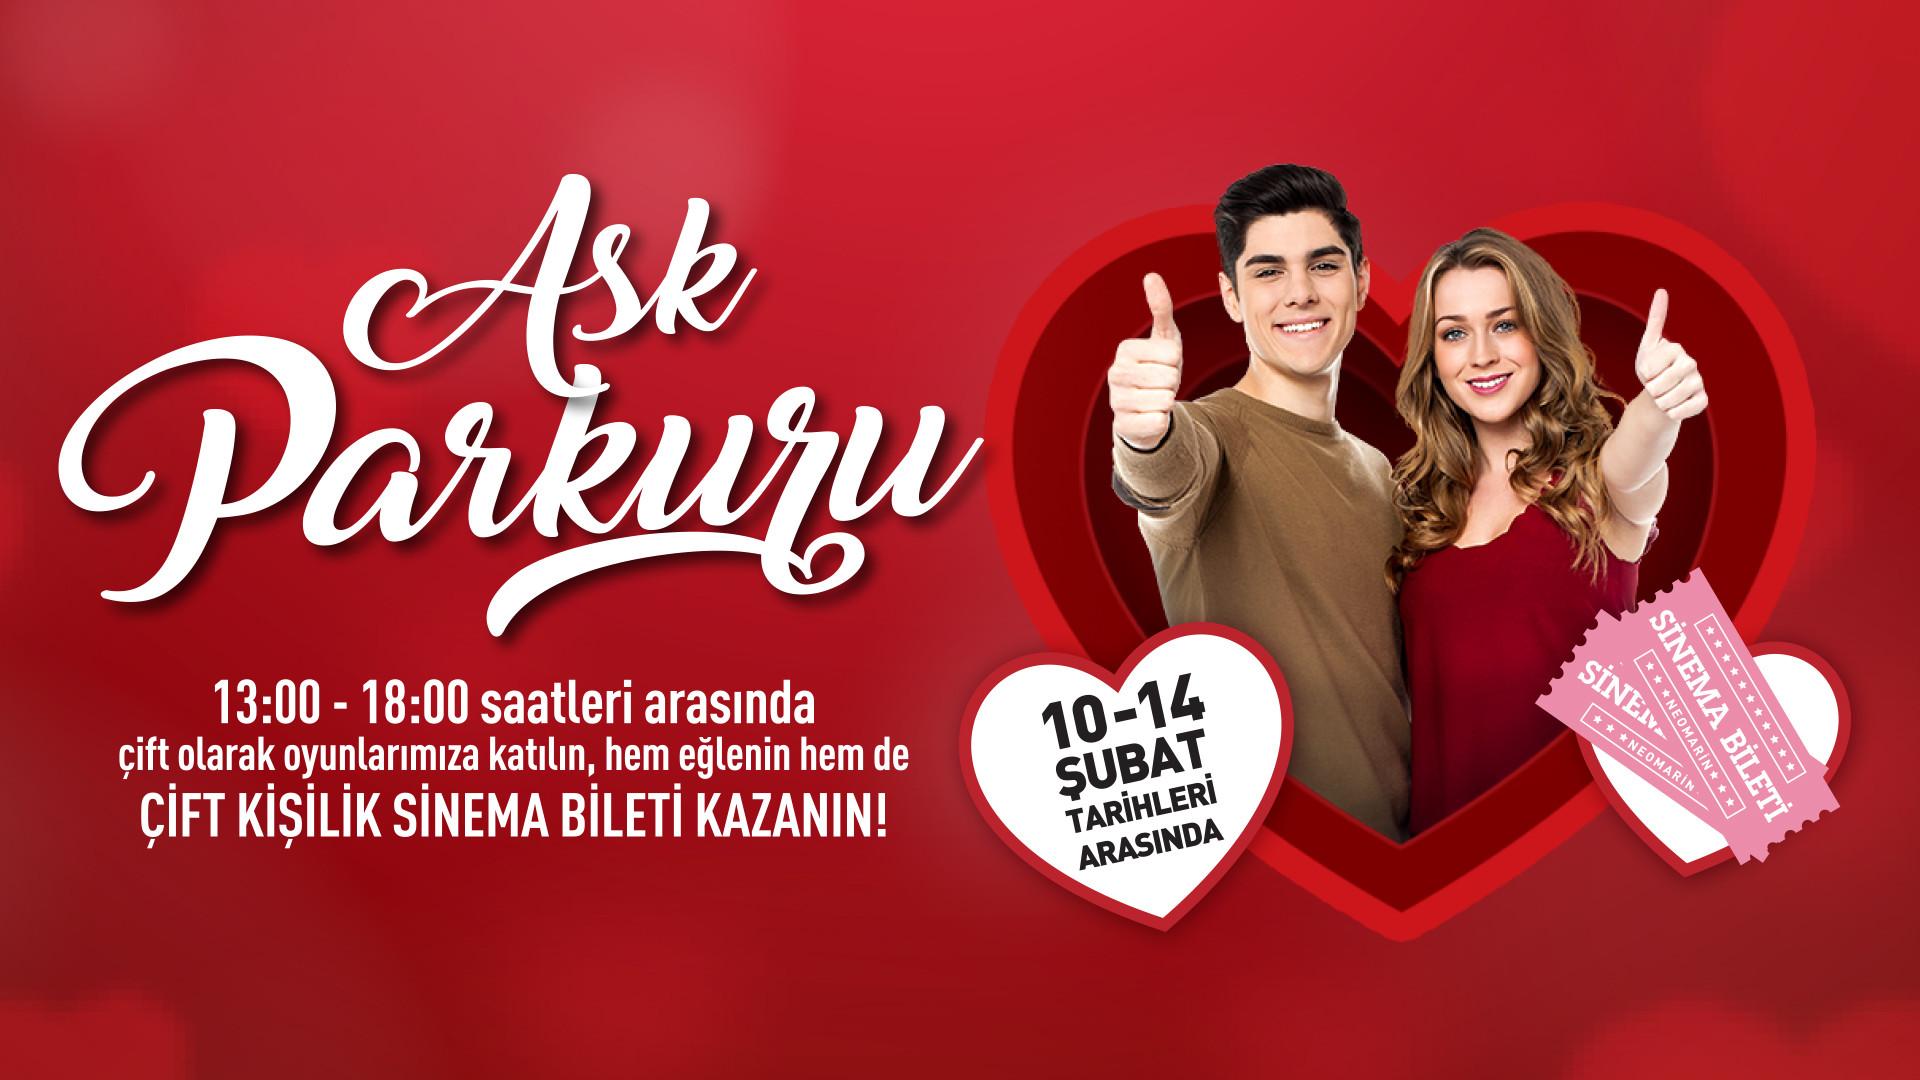 Aşk Parkuru